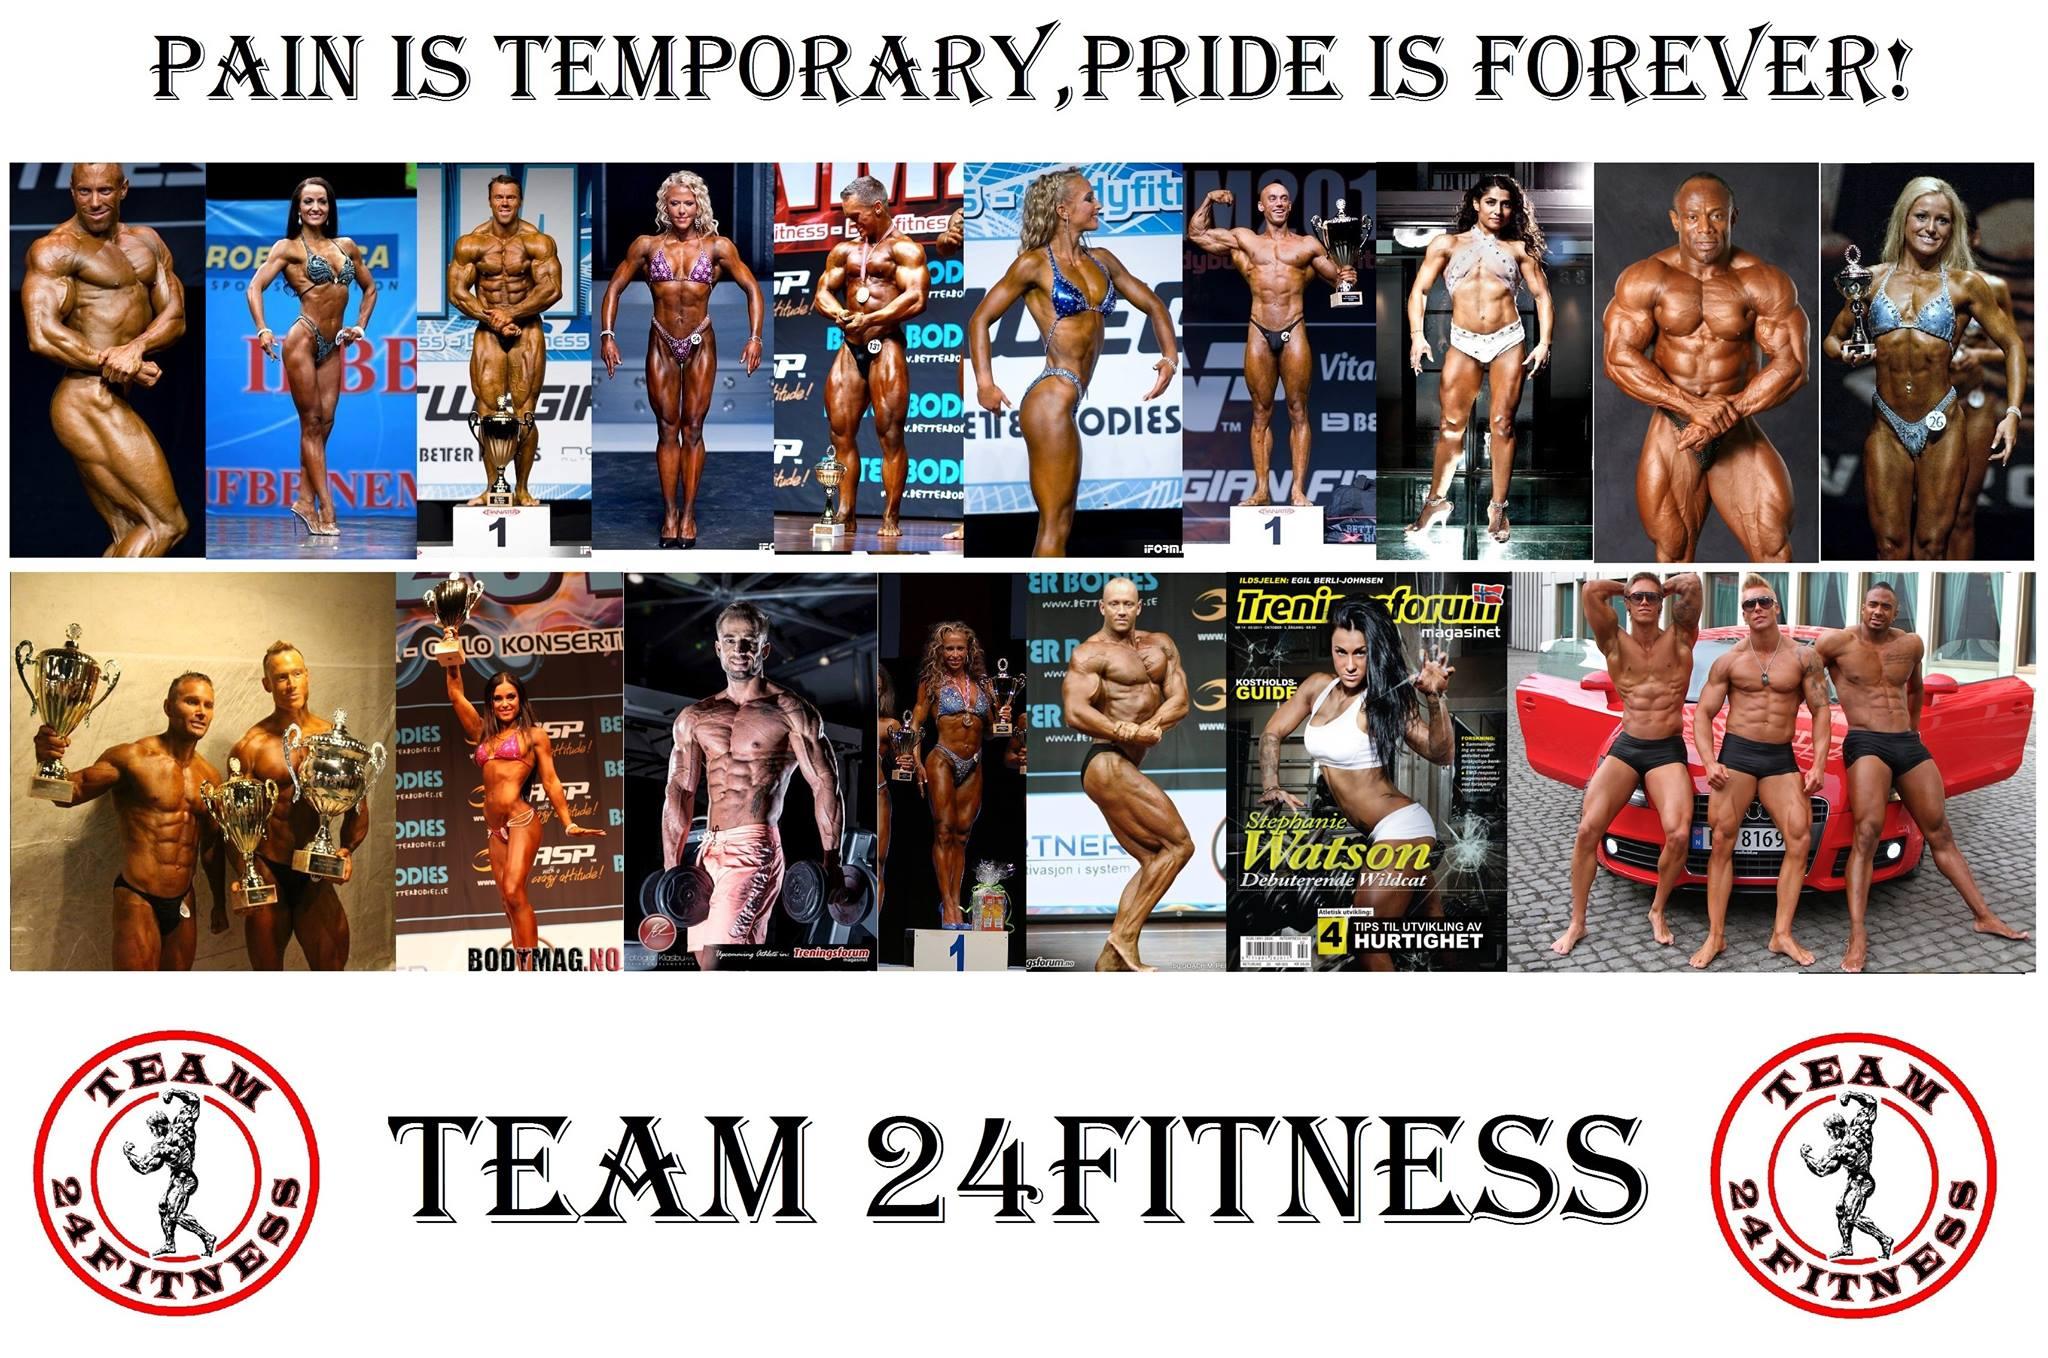 Team 24fitness